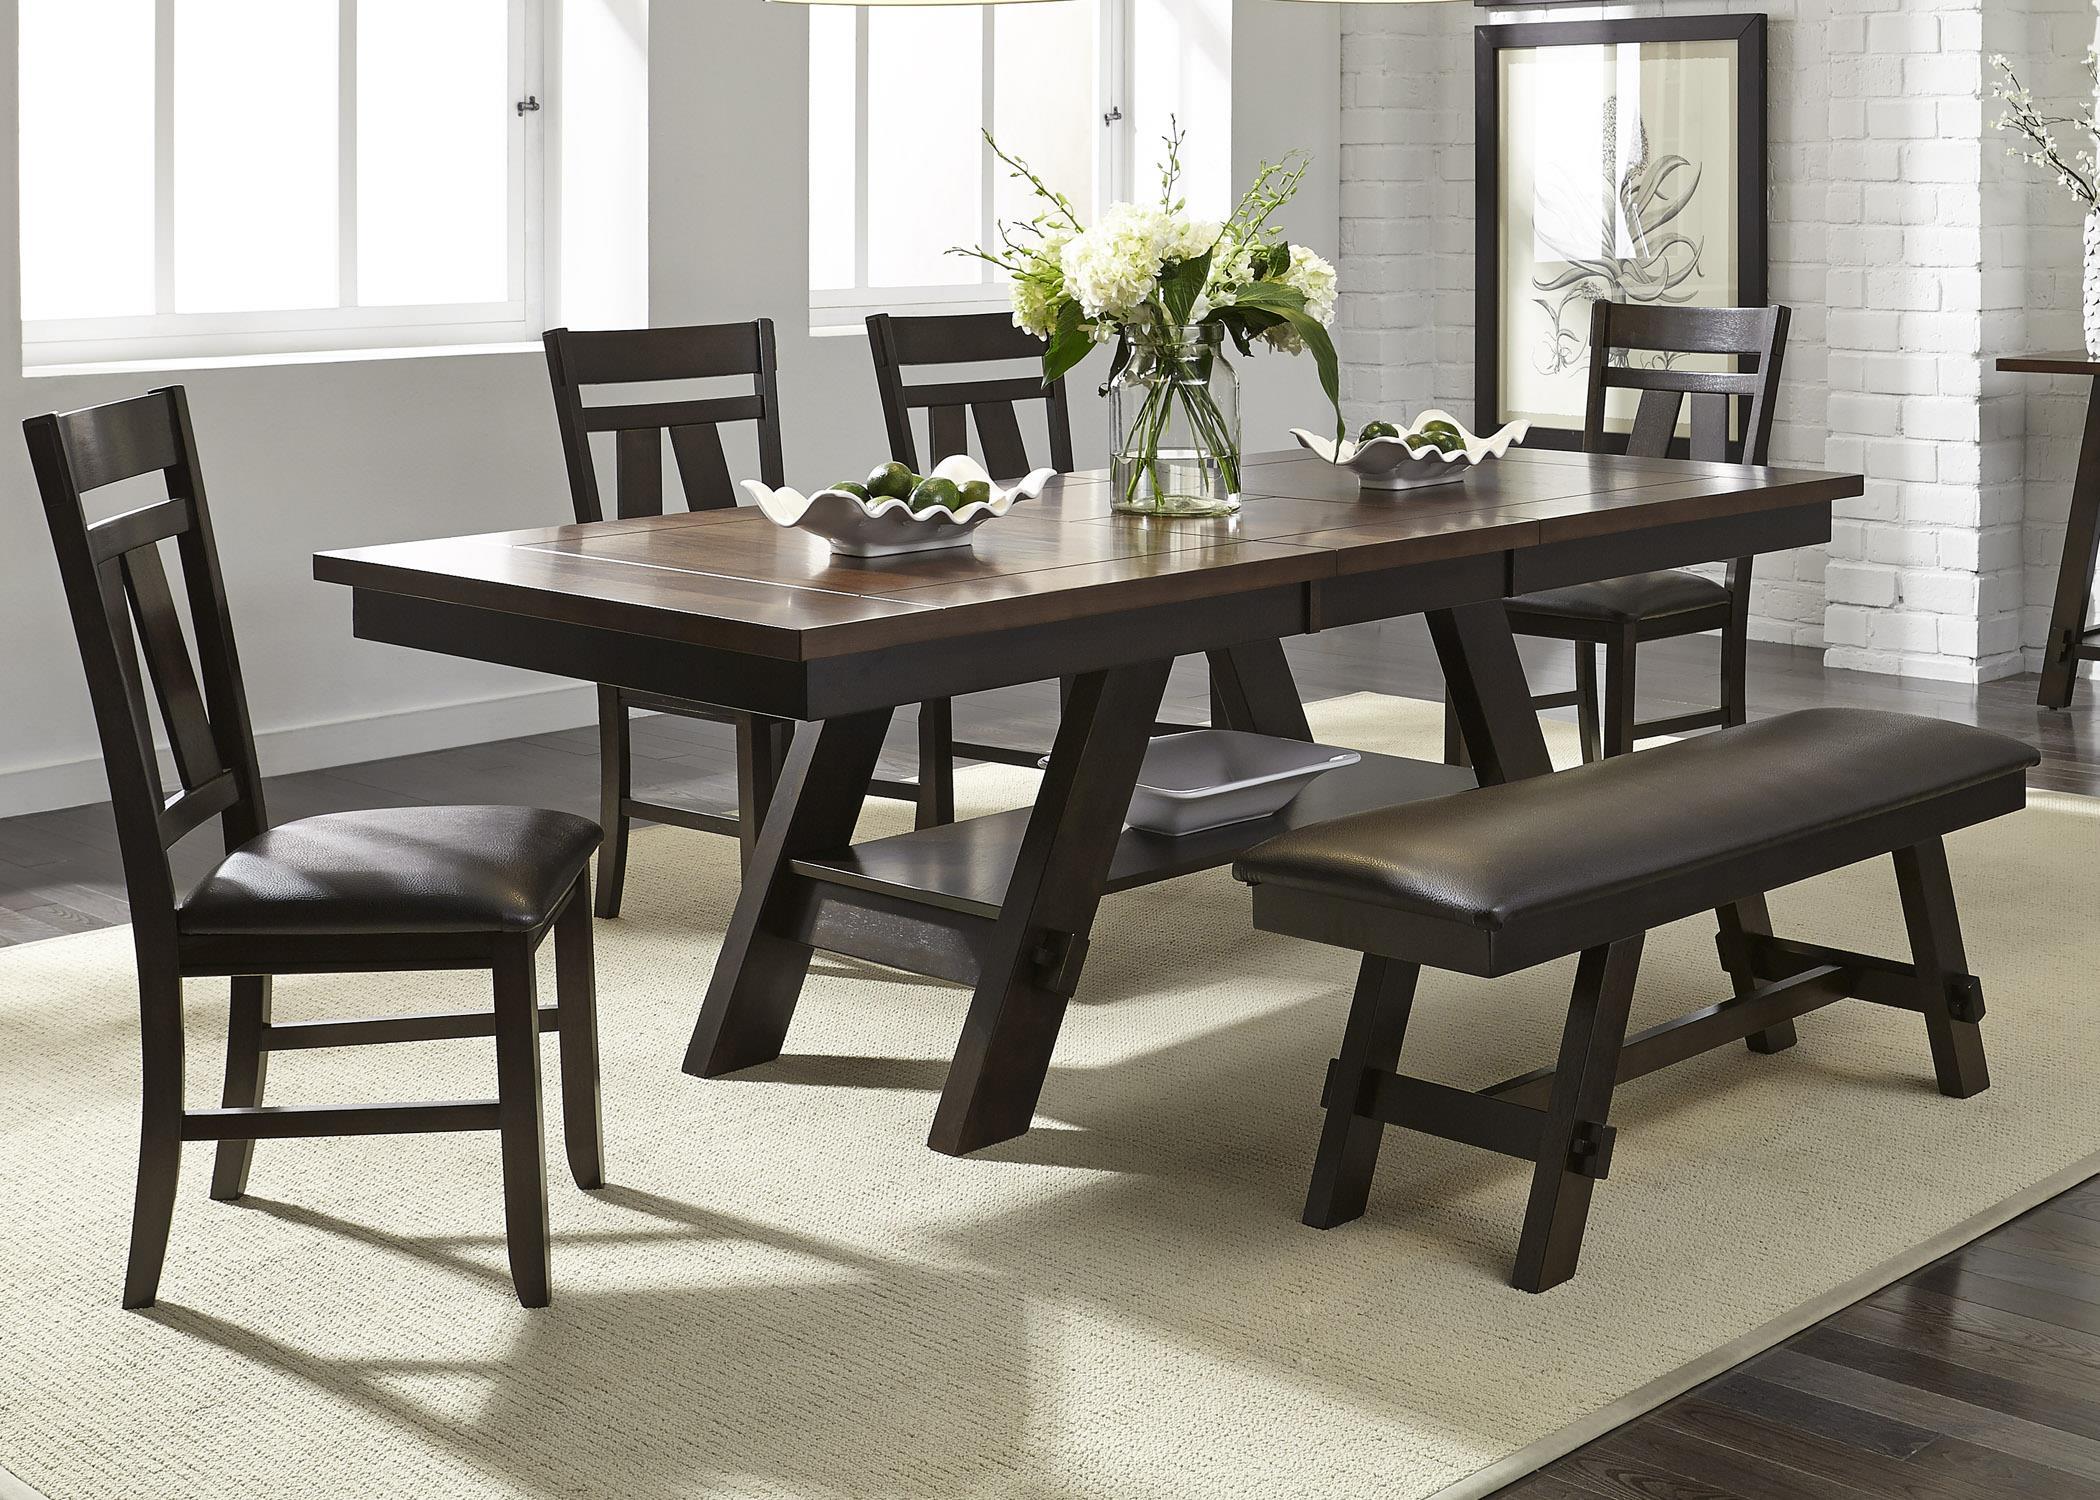 liberty furniture lawson 116 cd 6rts 6 piece rectangular table set hudson 39 s furniture dining. Black Bedroom Furniture Sets. Home Design Ideas